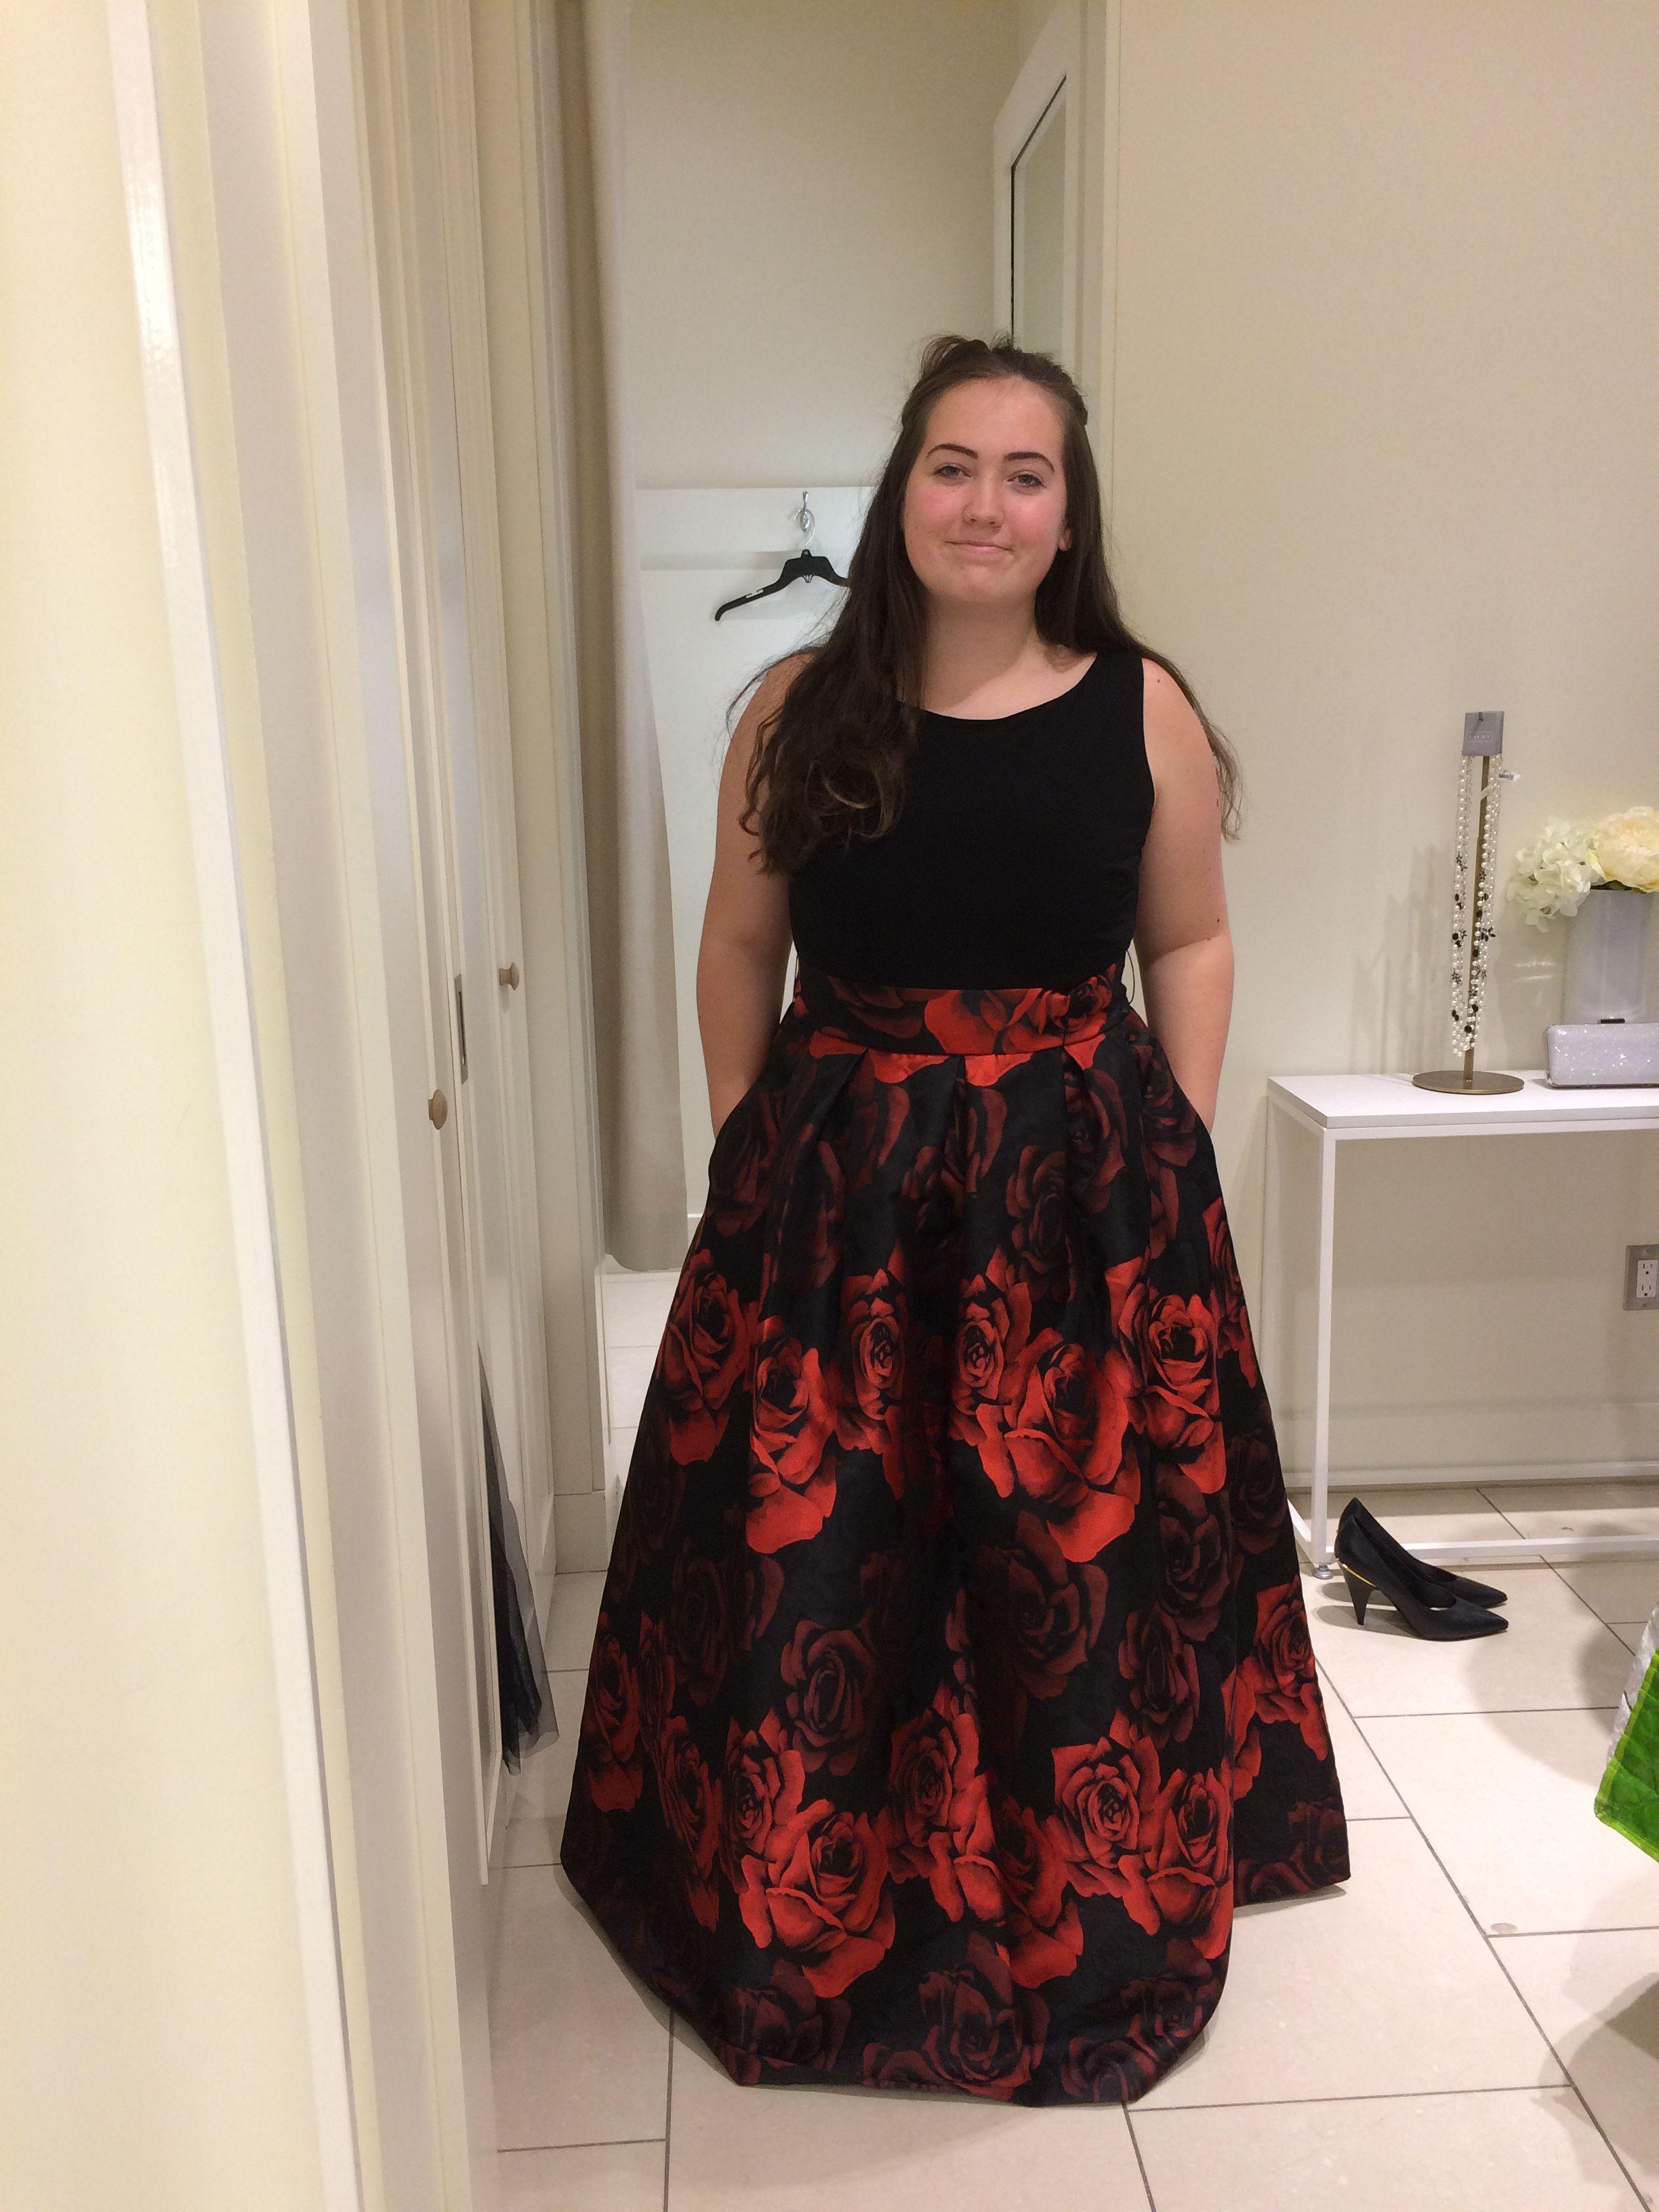 Black And Red Rose Prom Dress Rose Prom Dress Dresses Prom Dresses [ 3264 x 2448 Pixel ]